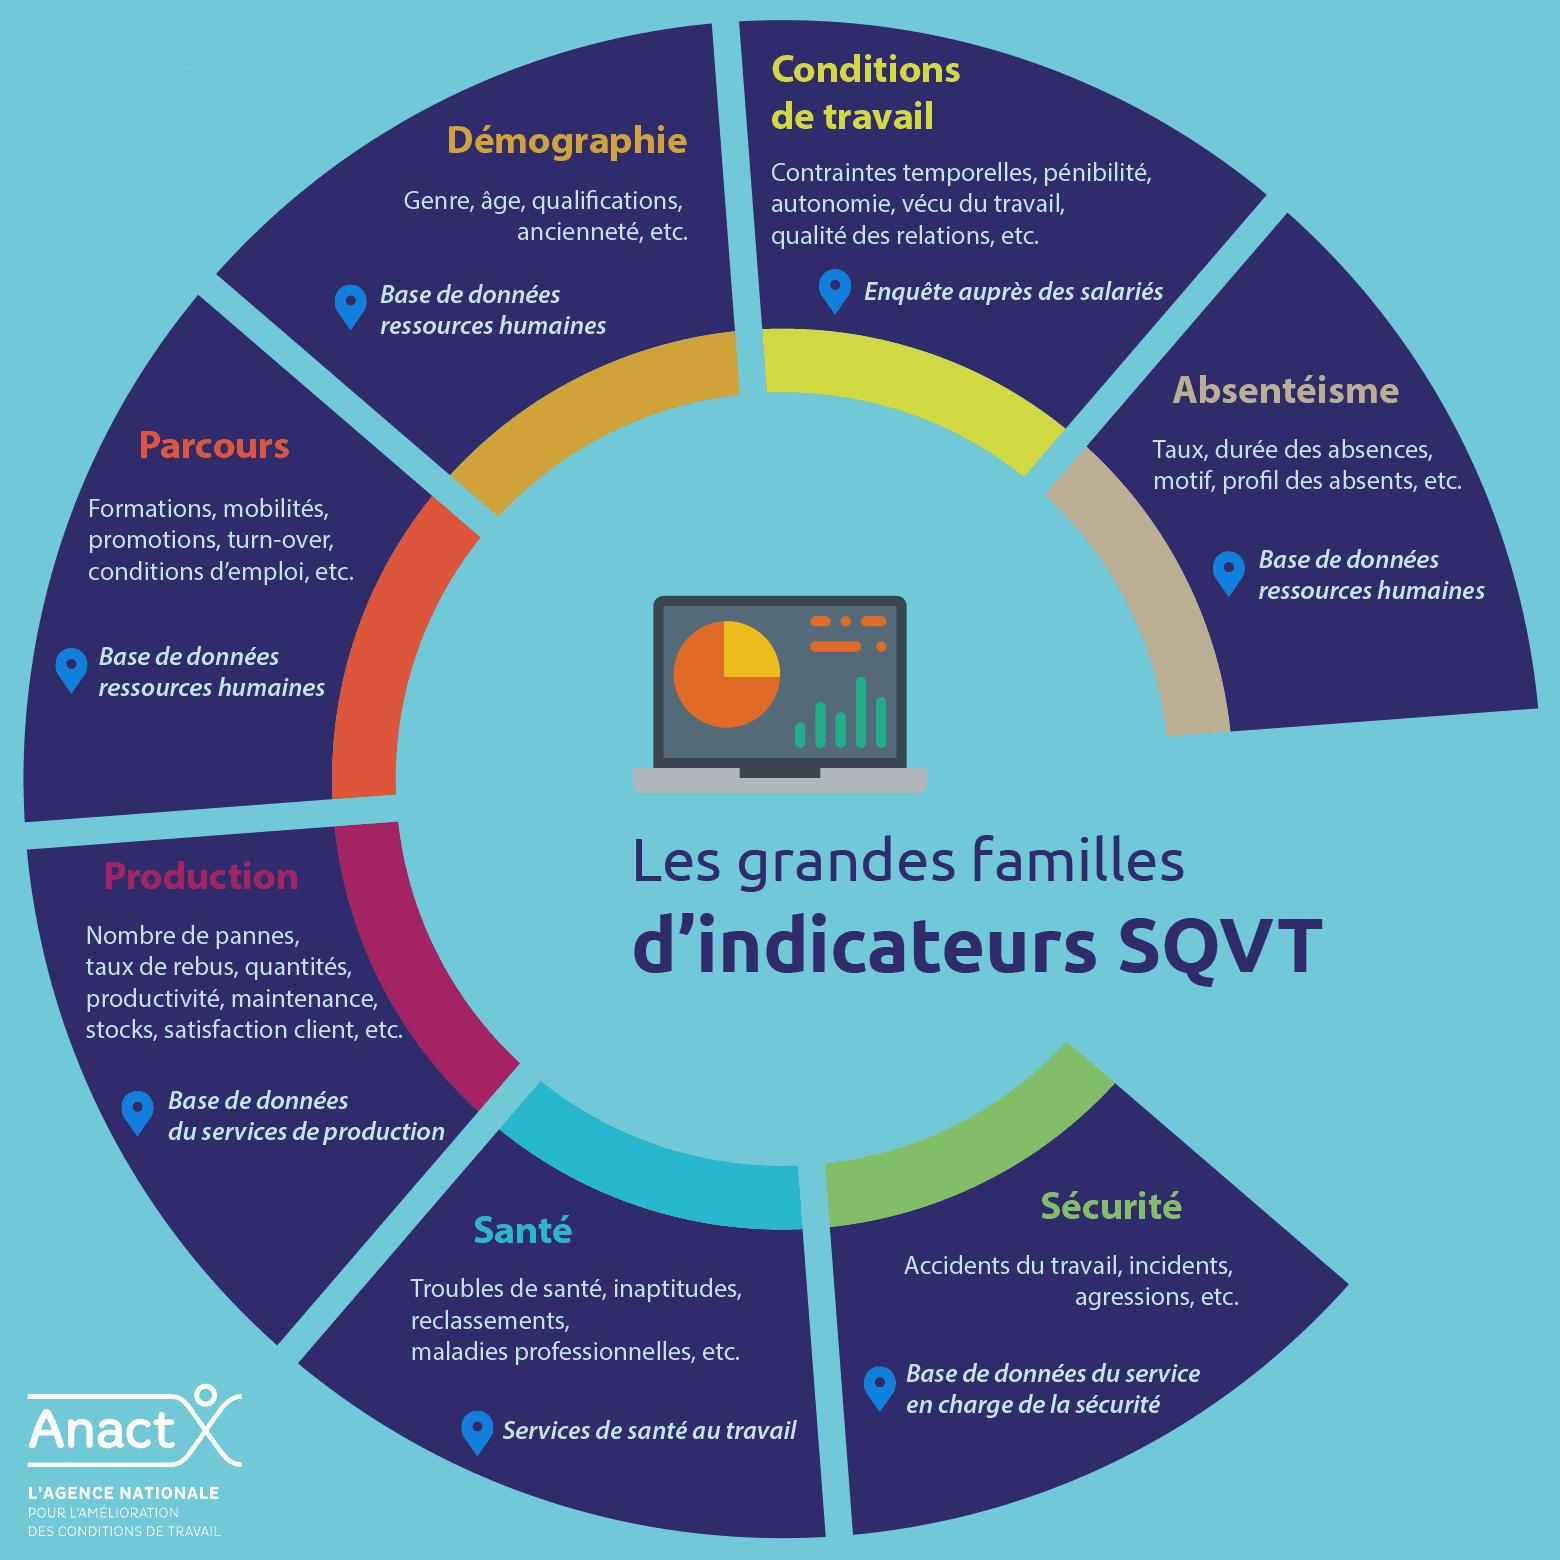 Anact indicateurs SQVT